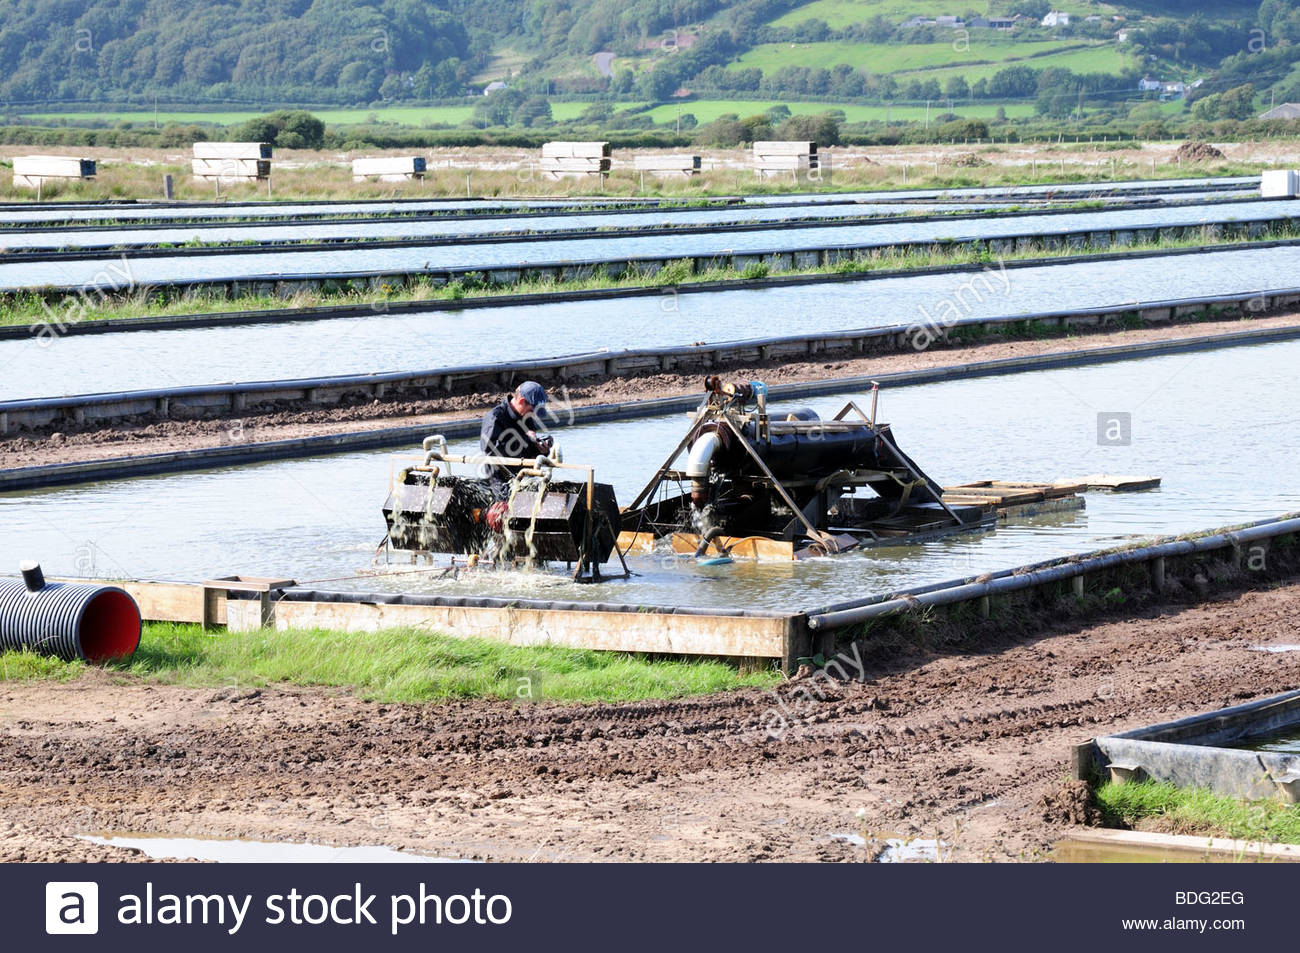 Lugworm Farmer working on a worm harvesting machine Carmarthenshire Wales Cymru UK - Stock Image